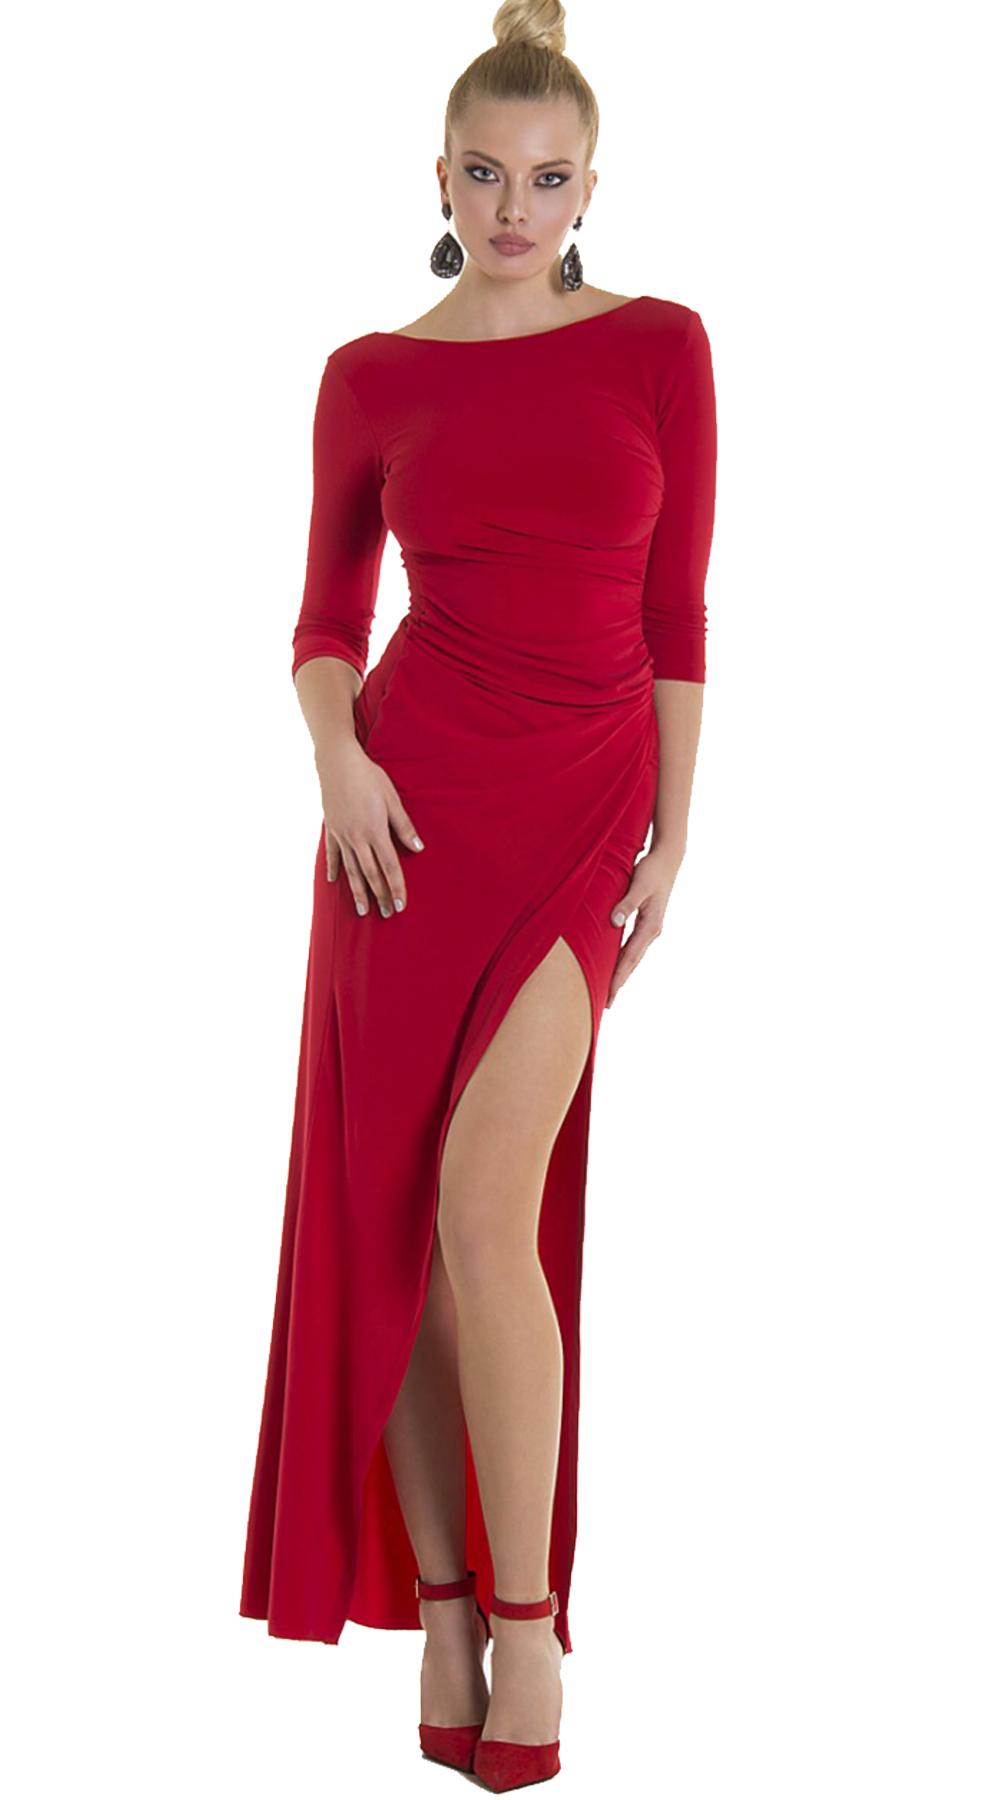 Maxi Εξώπλατο Φόρεμα με cut out ONLINE - ONLINE - SP19ON-50005-missreina φορέματα βραδυνά φορέματα